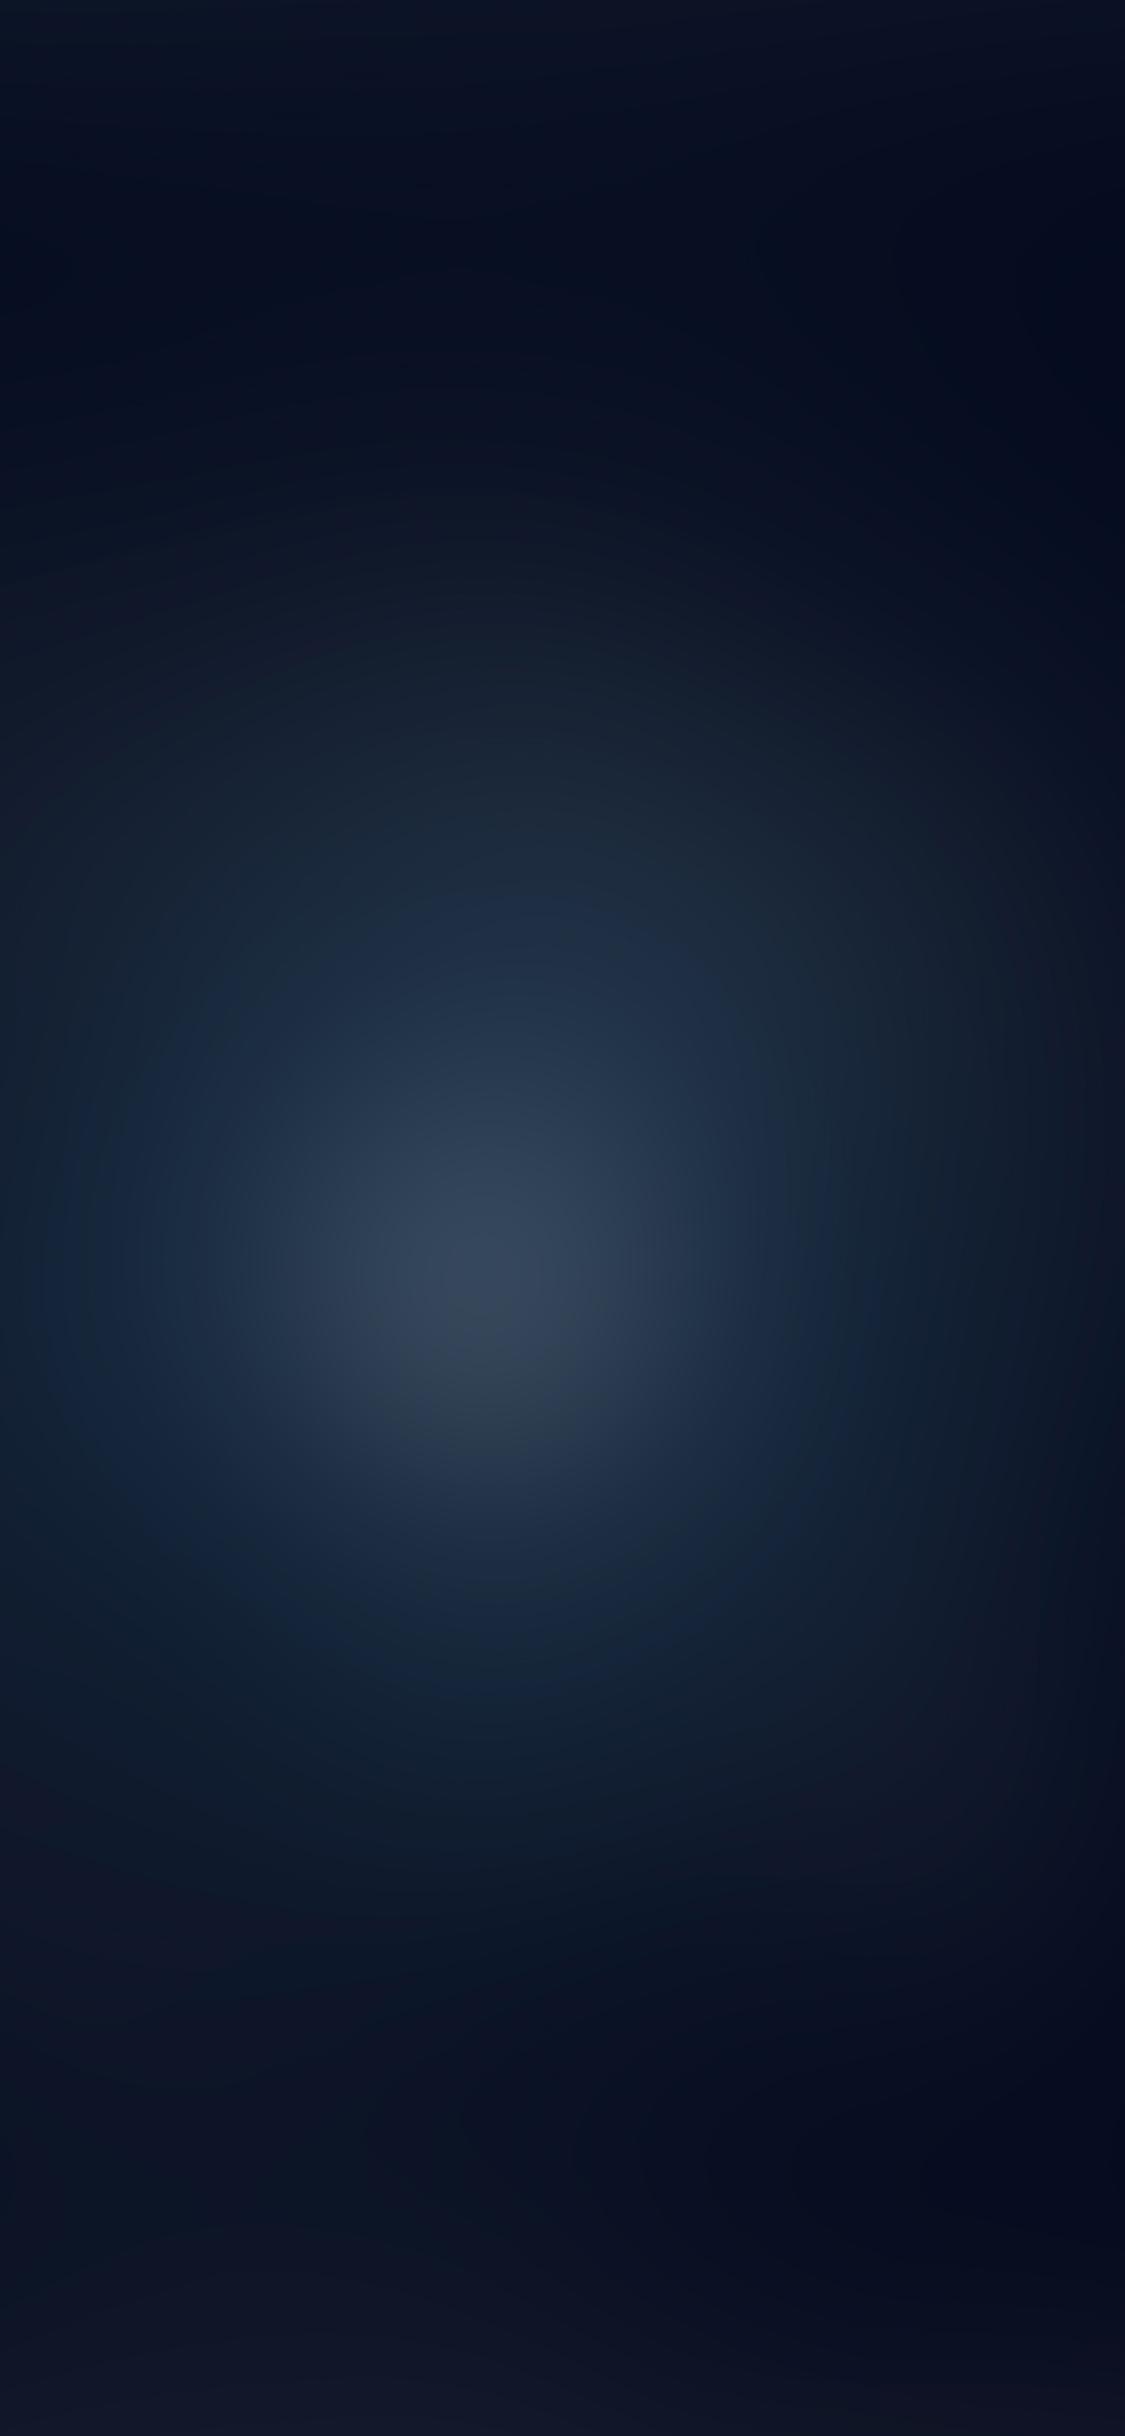 Dark Blue Wallpaper Hd Posted By Michelle Mercado